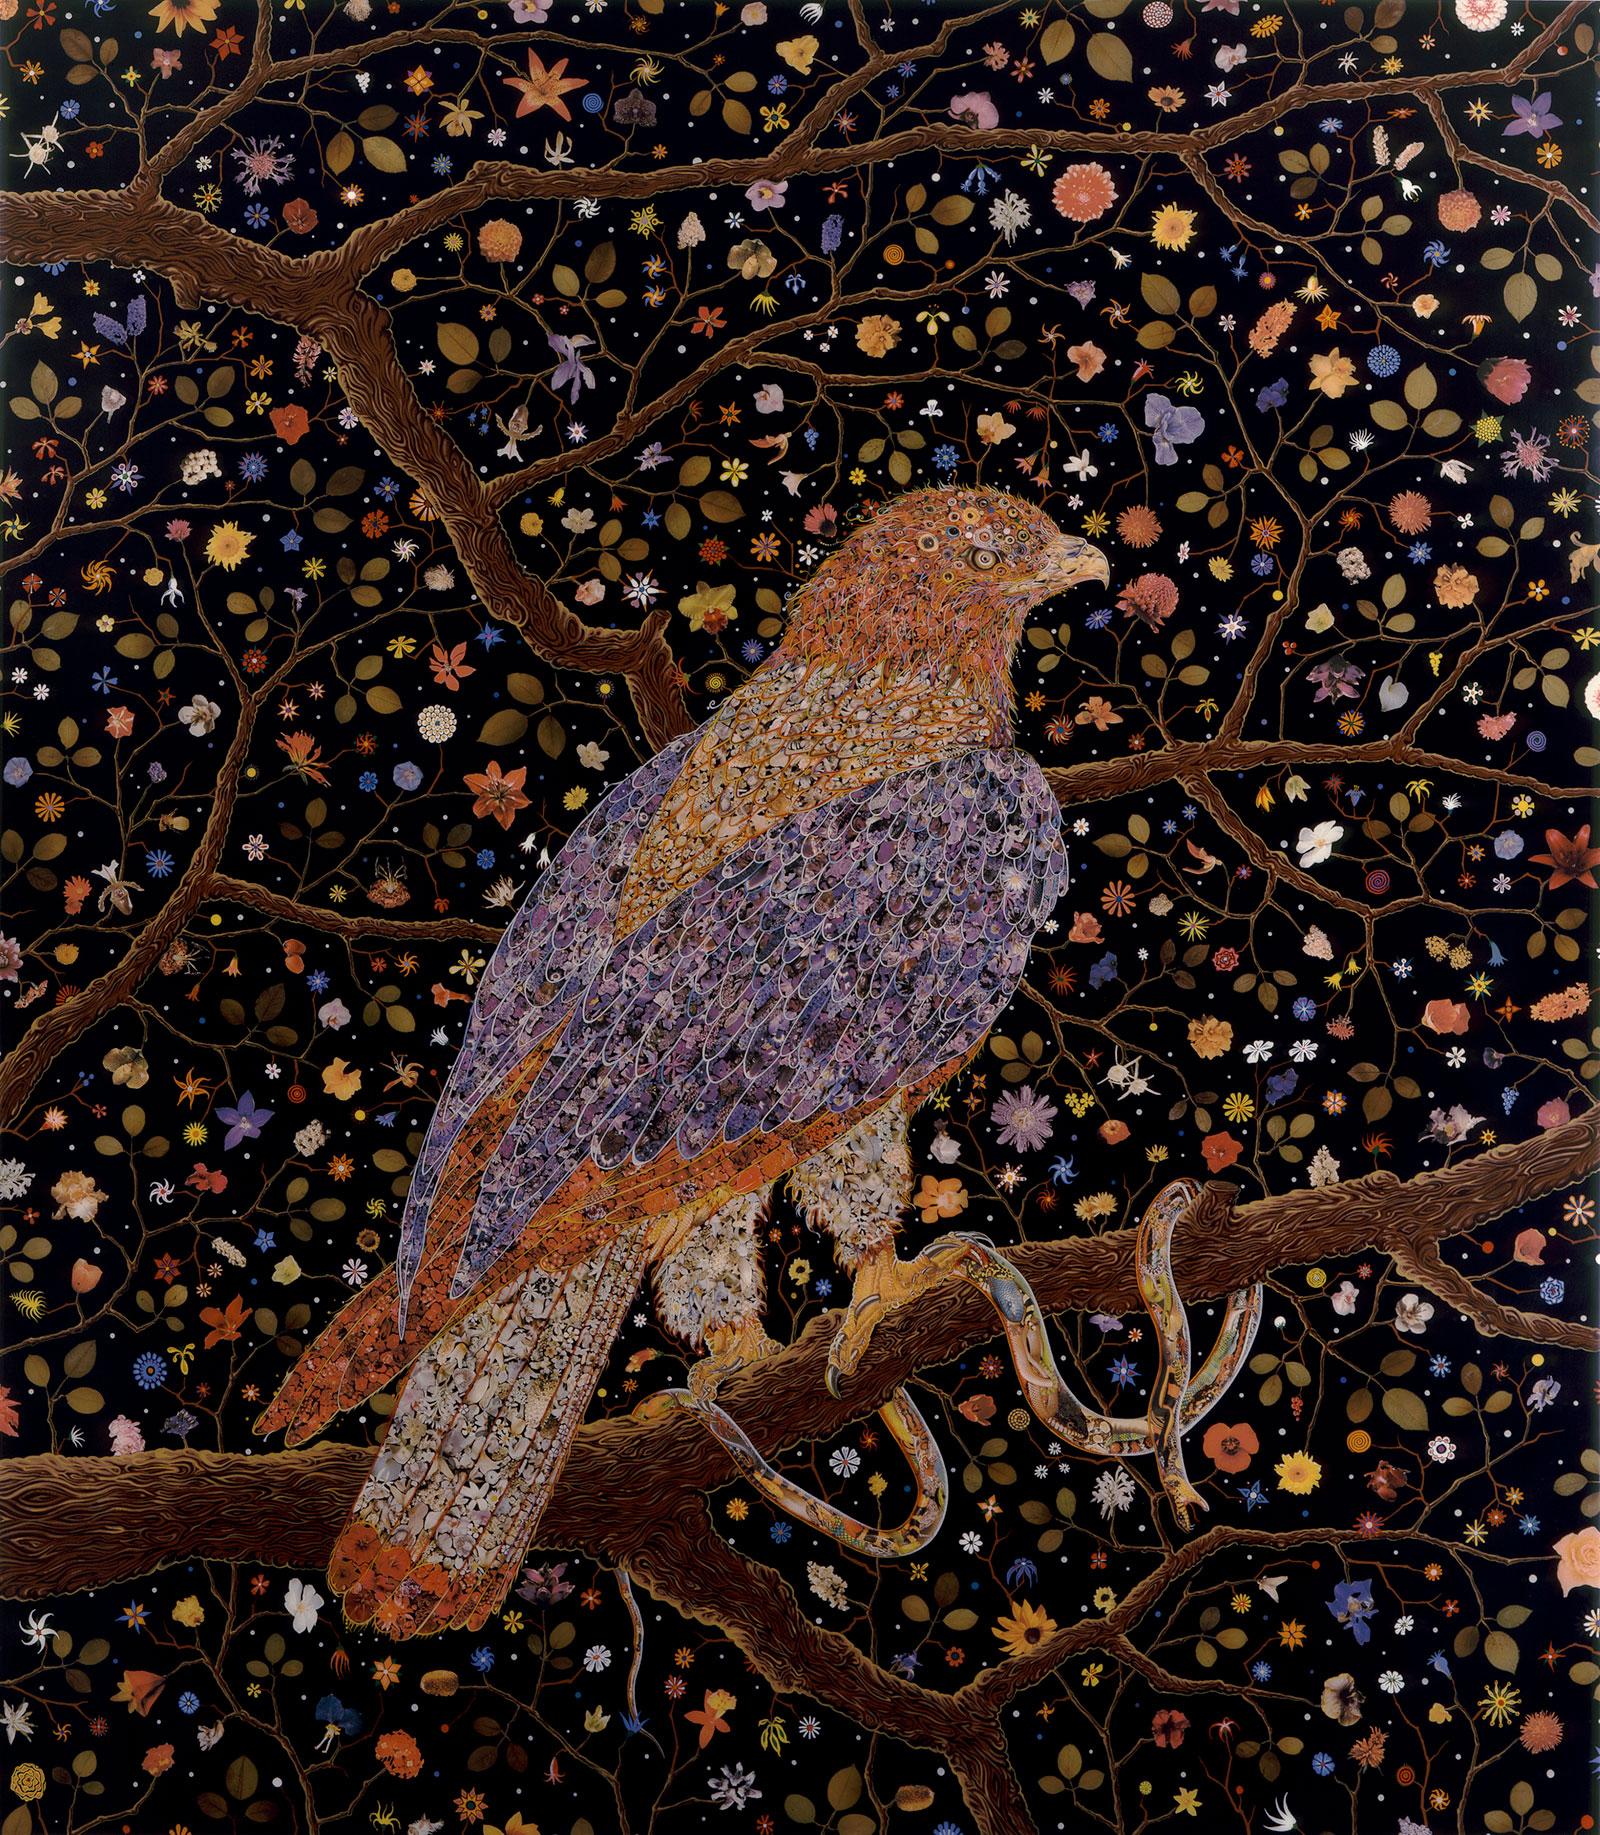 painting of raptor holding snake on tree limb